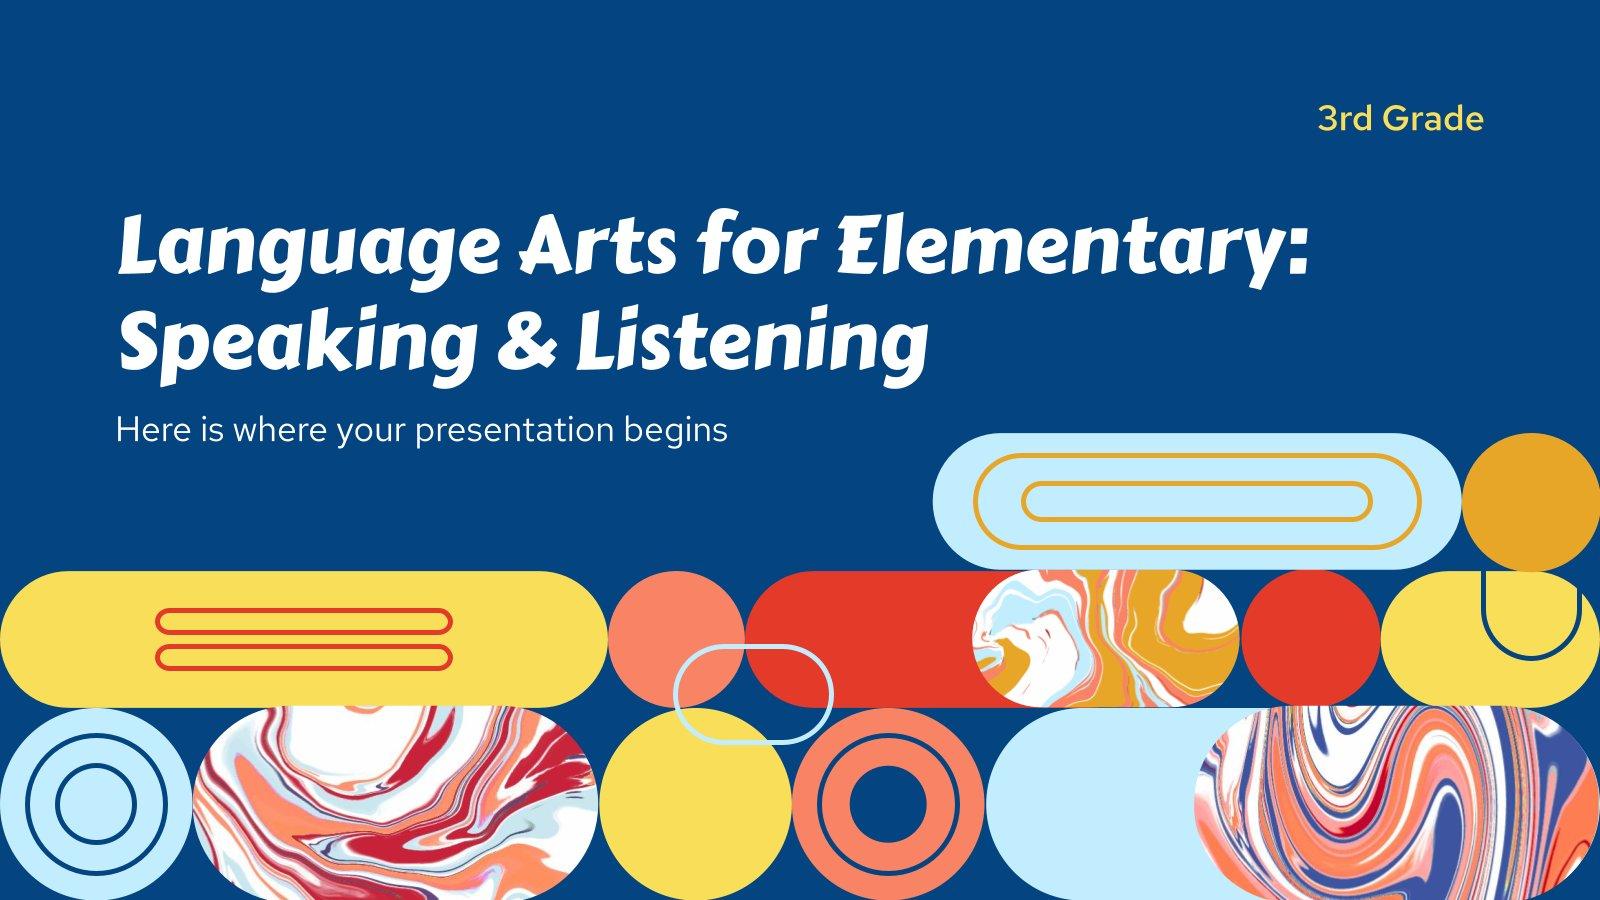 Language Arts for Elementary - 3rd Grade: Speaking & Listening presentation template